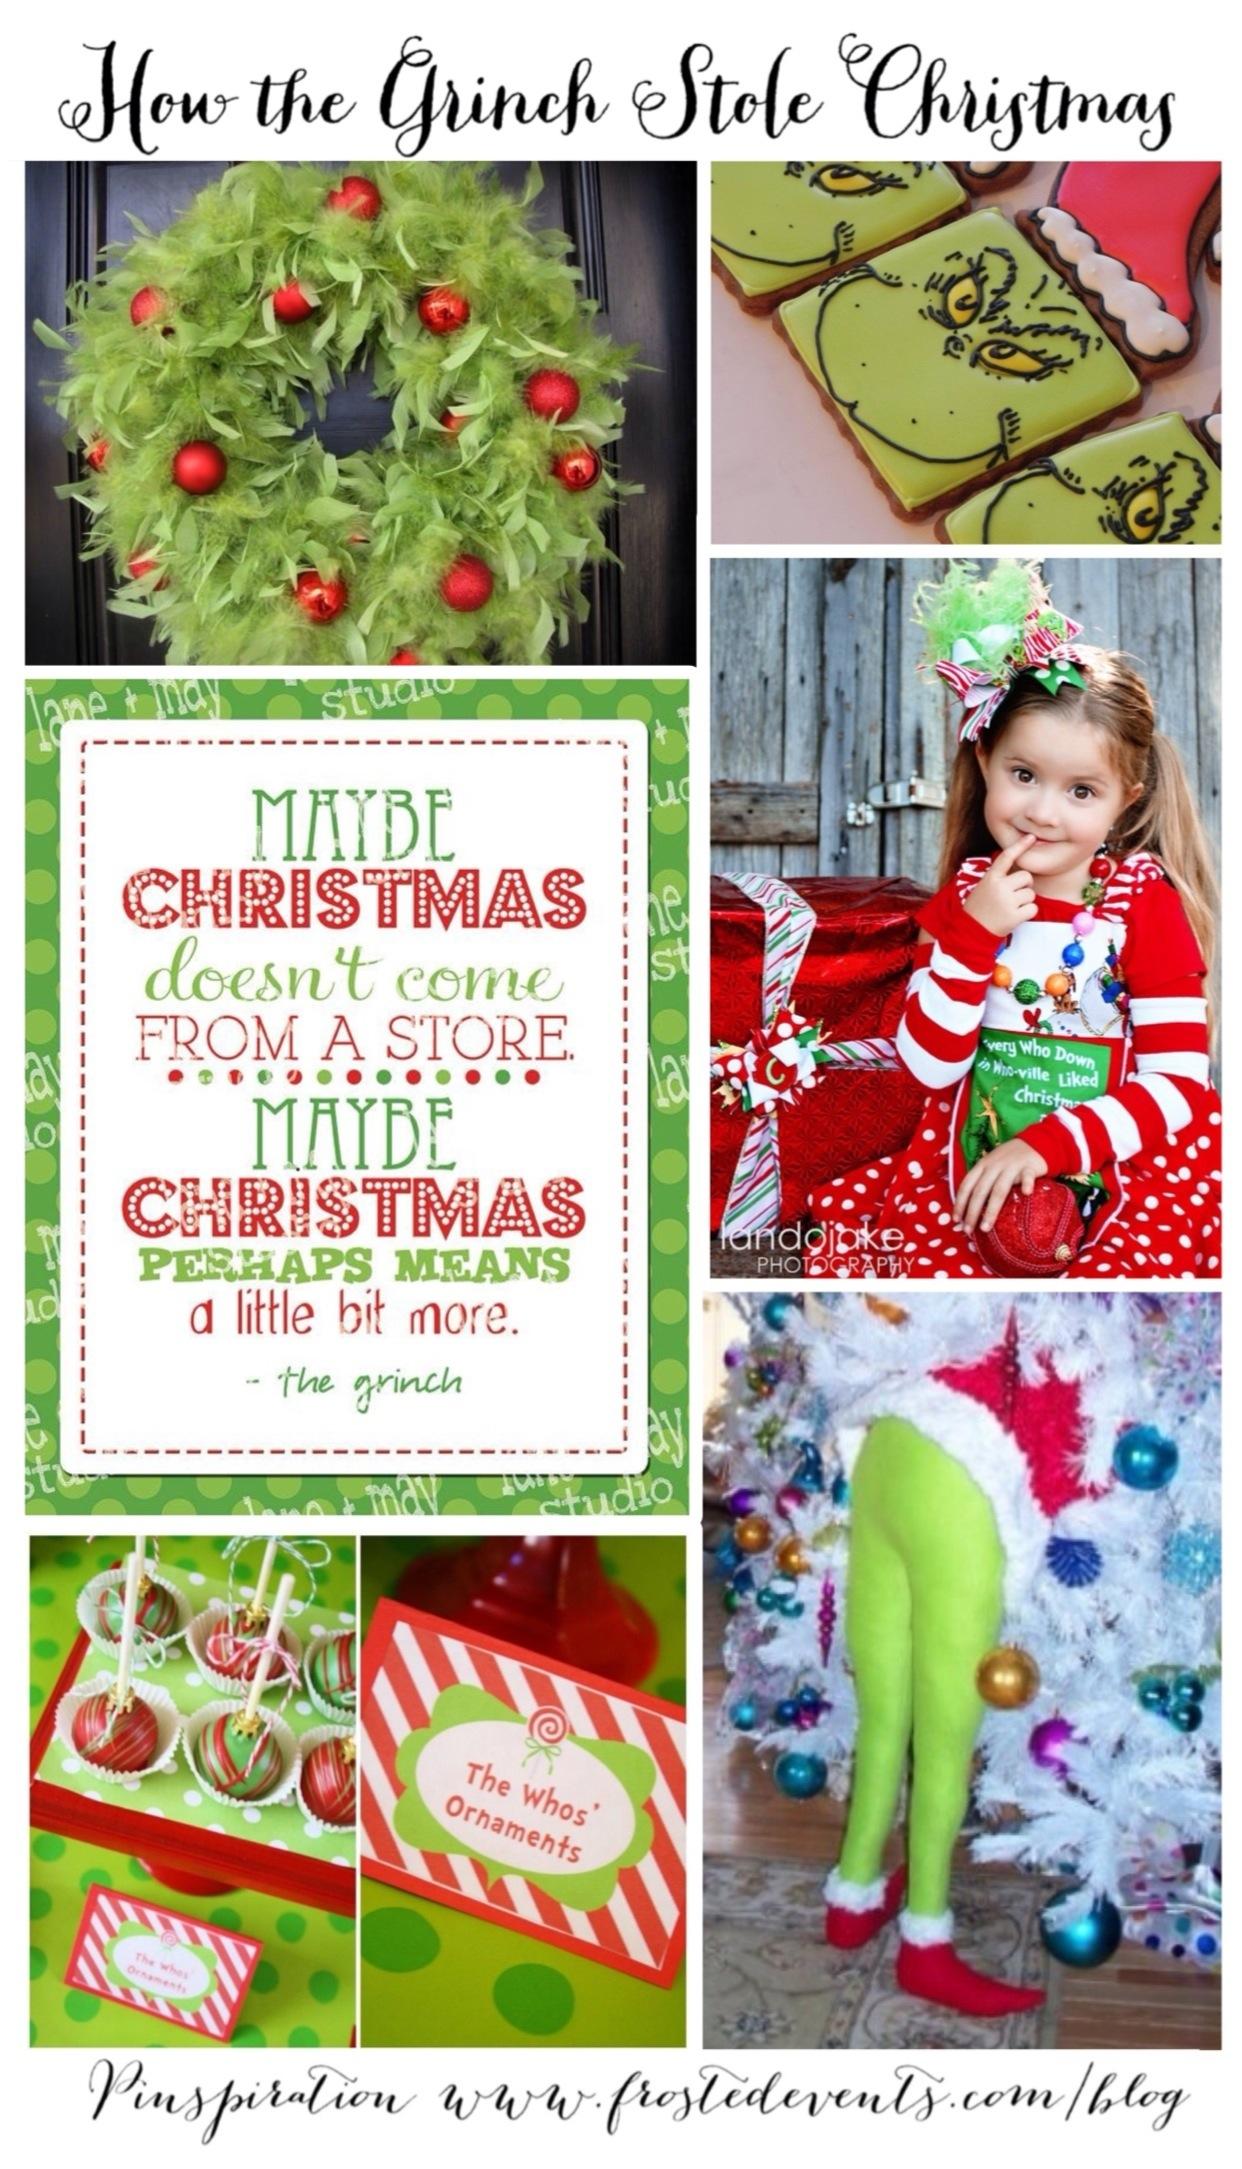 Christmas Ideas How The Grinch Stole Christmas Inspiration